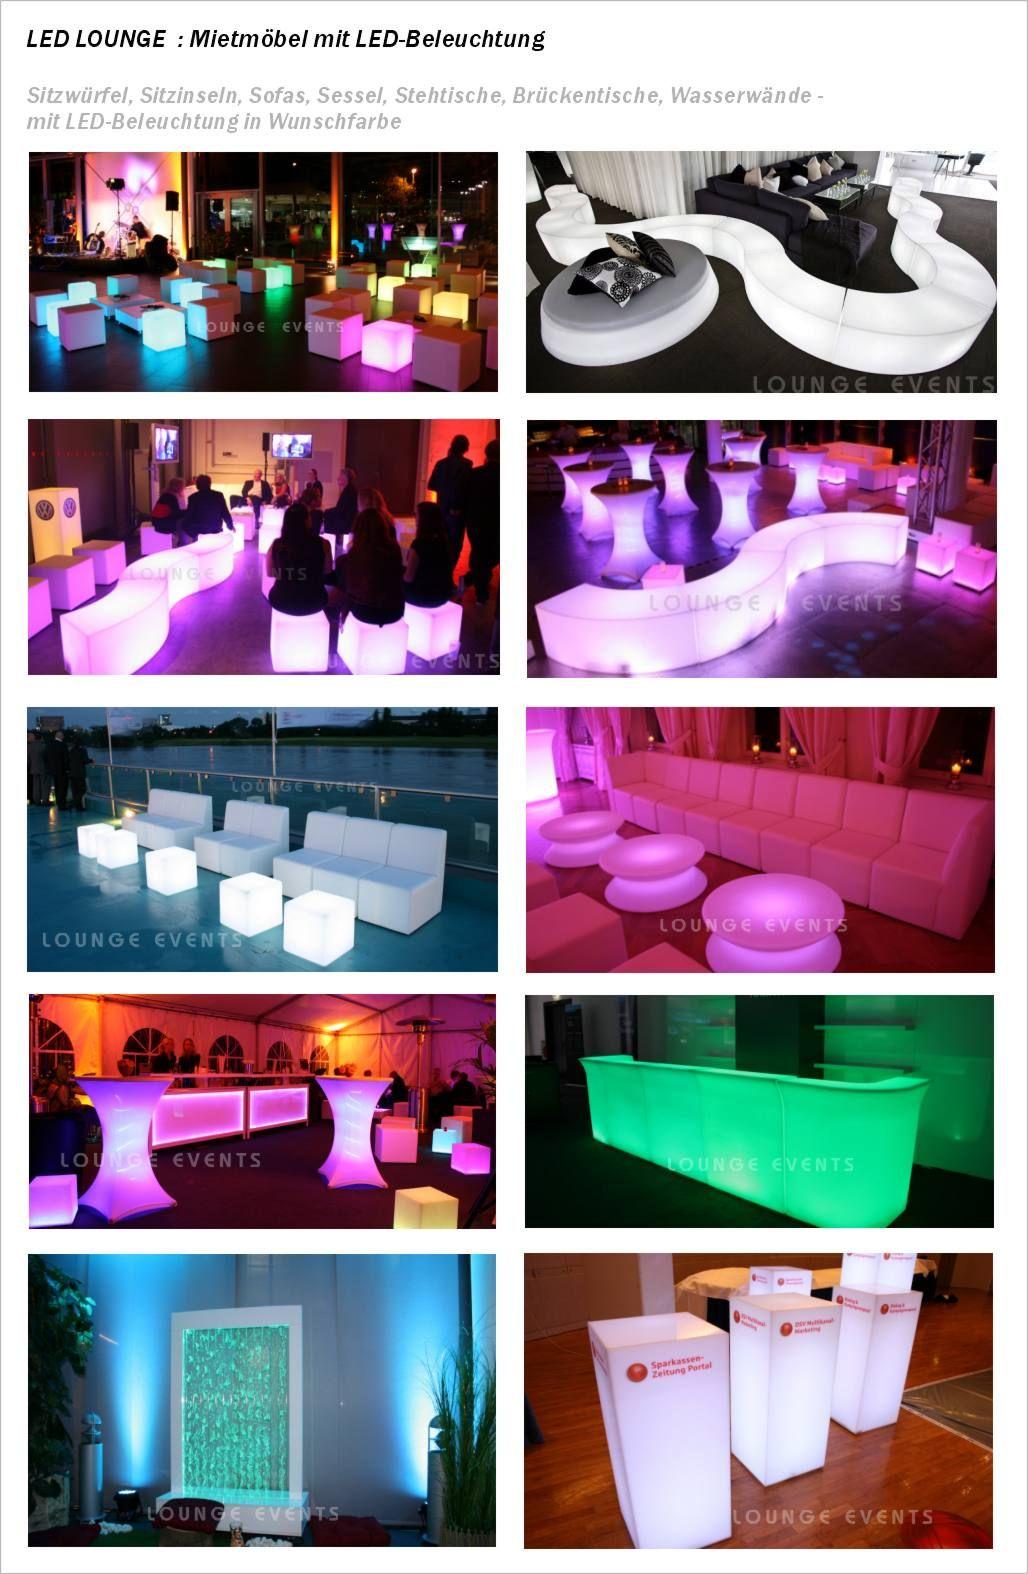 Lounge Events Mietmobel Loungemobel Mieten Led Mobel Verleih Vermietung Verleih Lounge Lounge Mobel